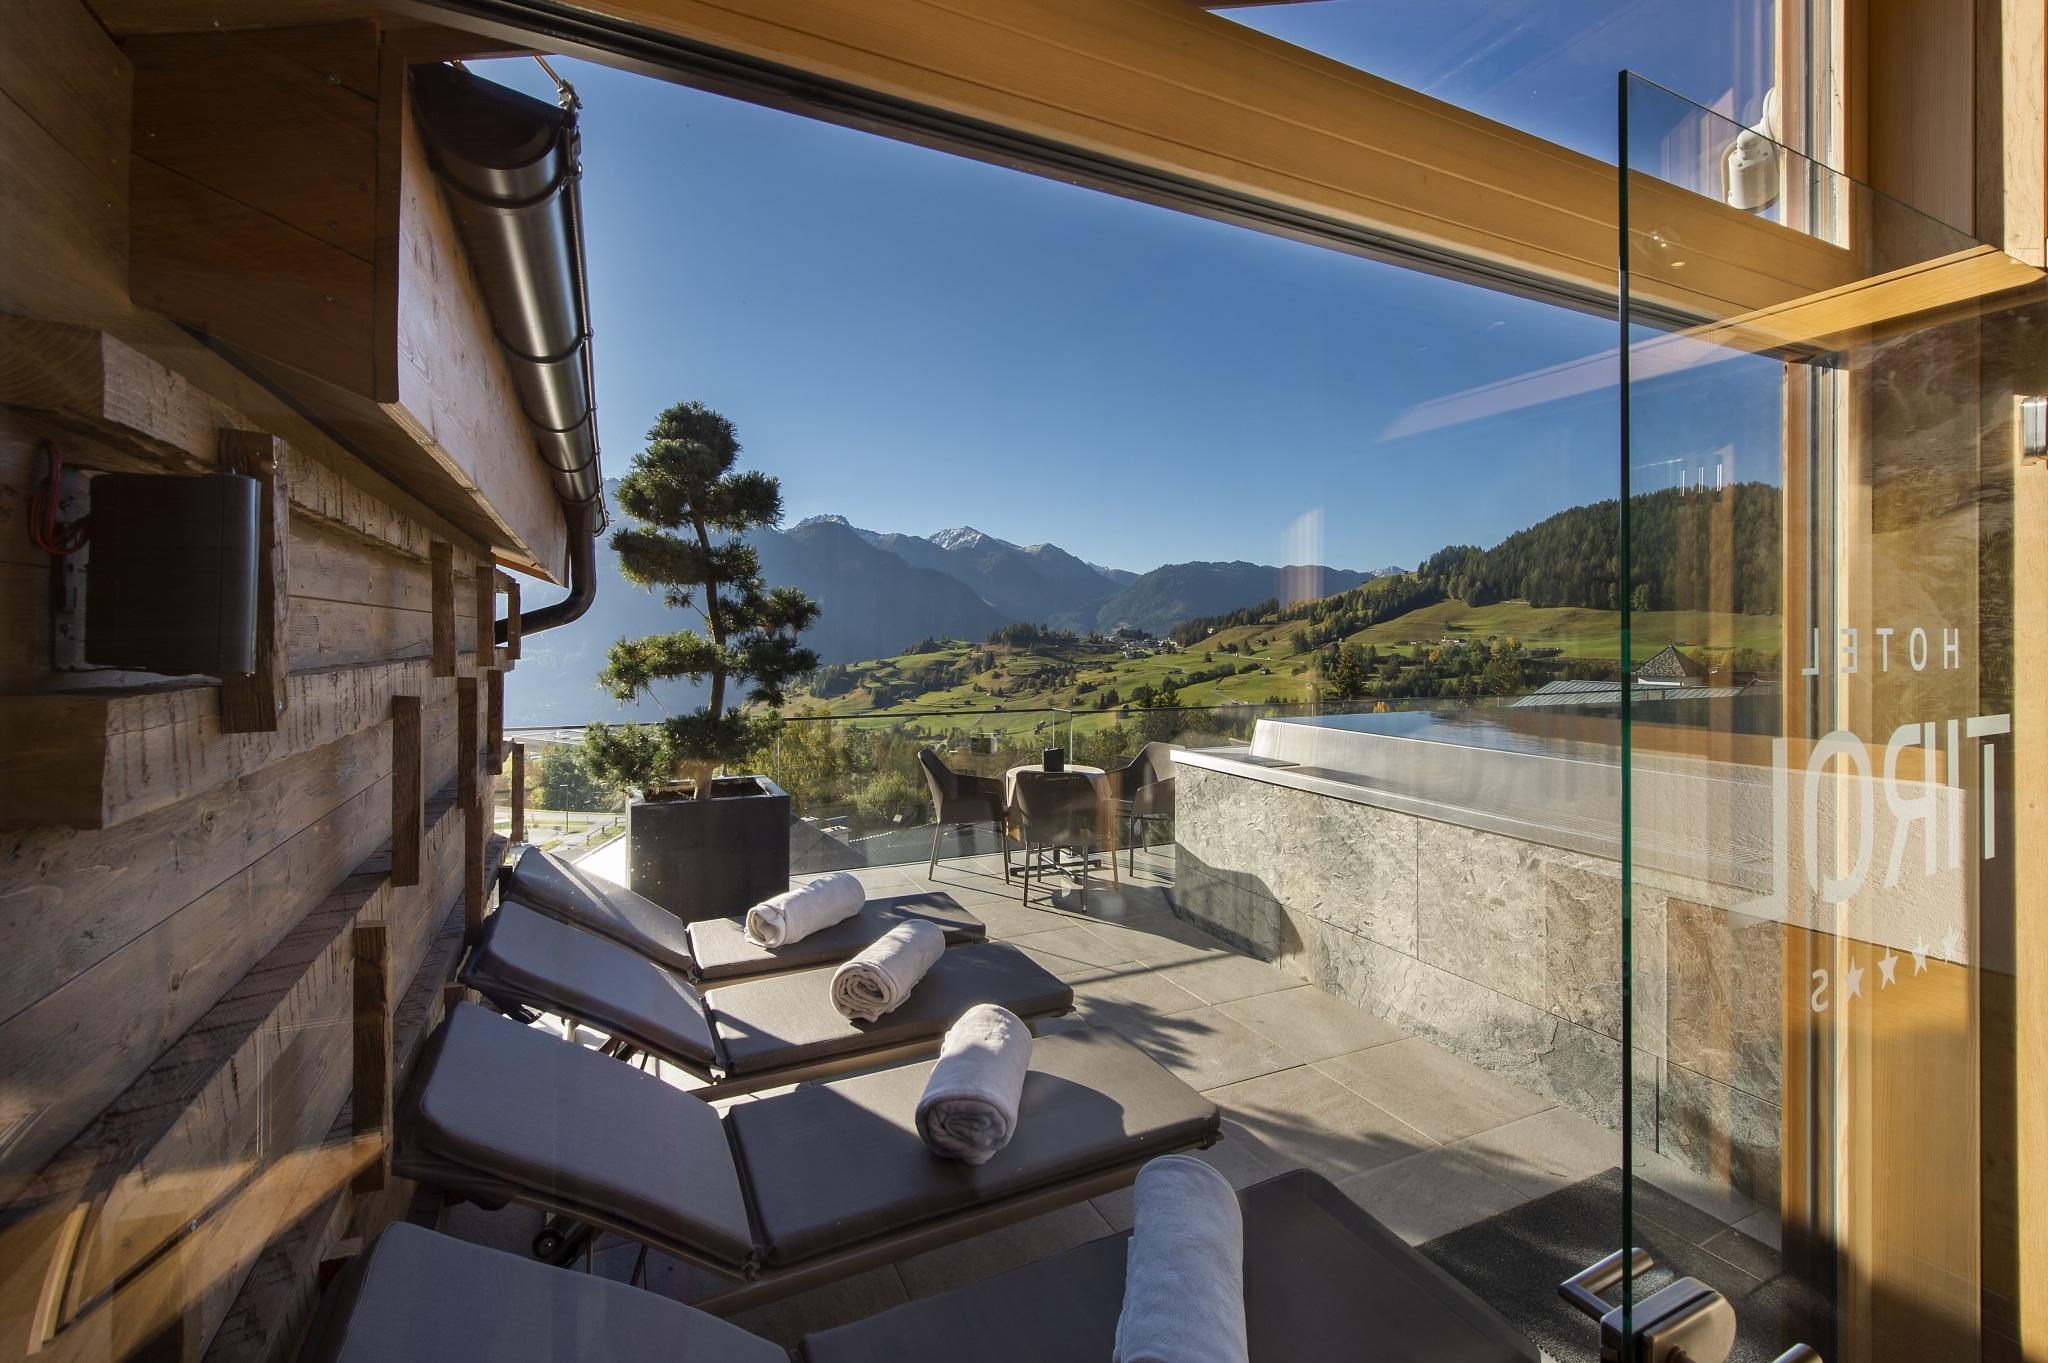 Hotel Tirol - SKY Spa